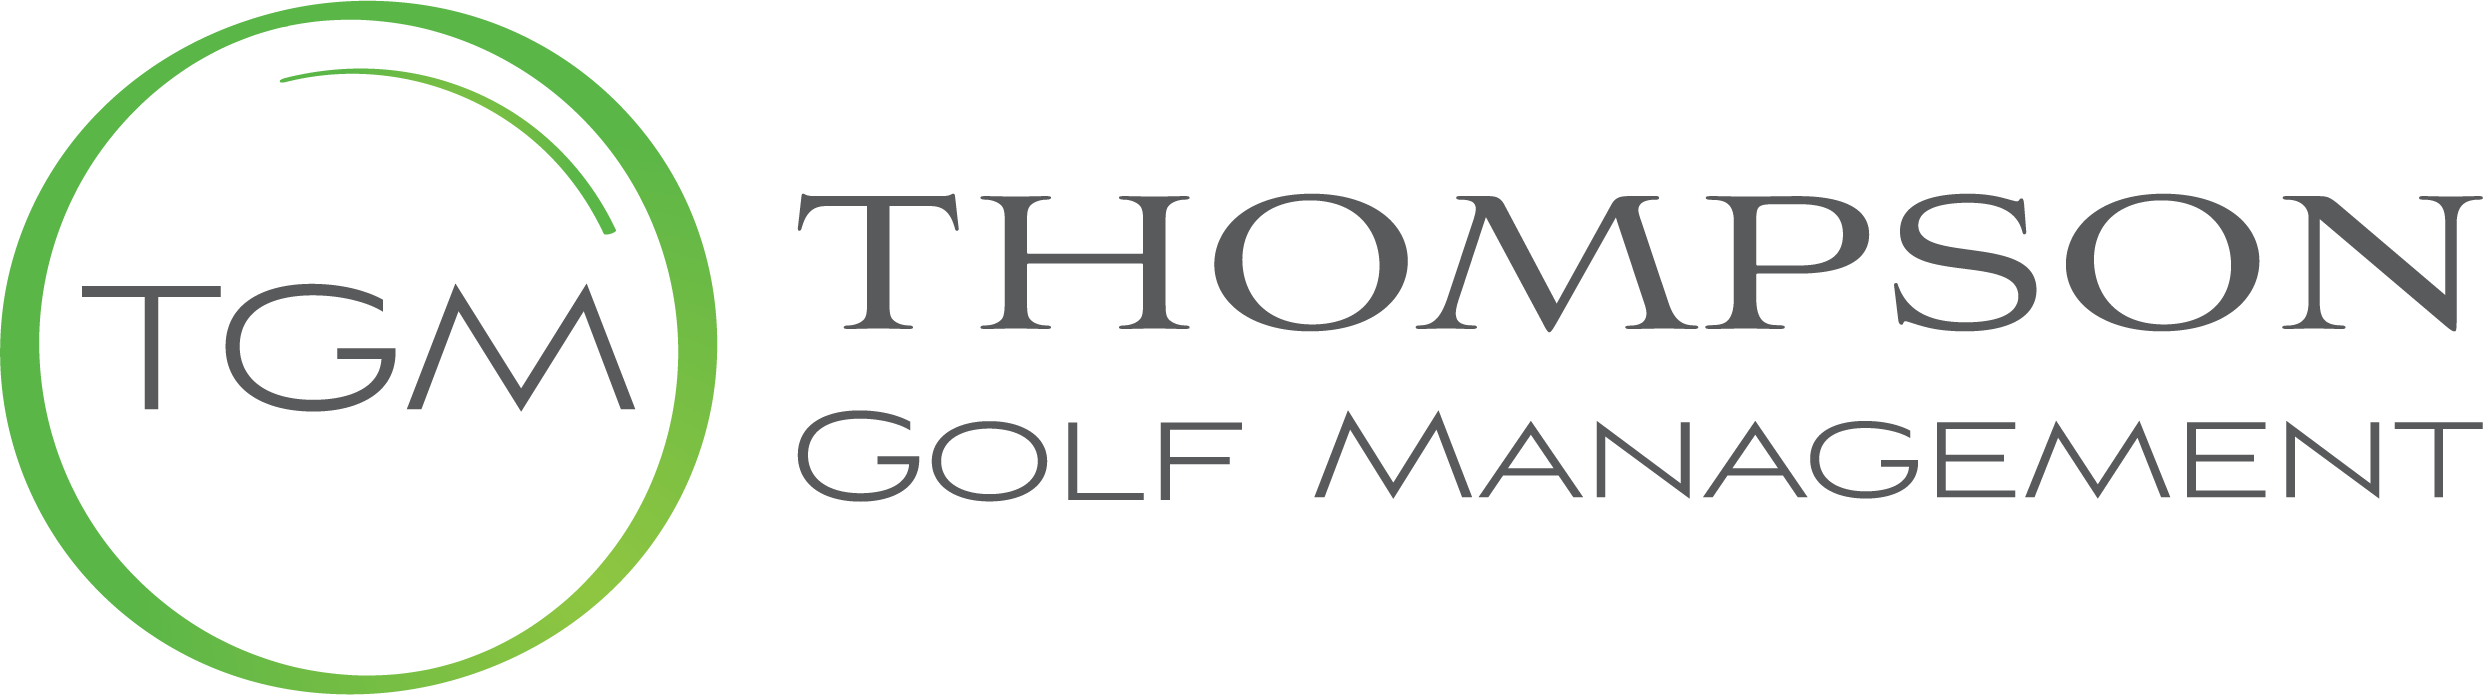 images/widgetkit/course-logos/Thompson_Golf_Management_Logo.png